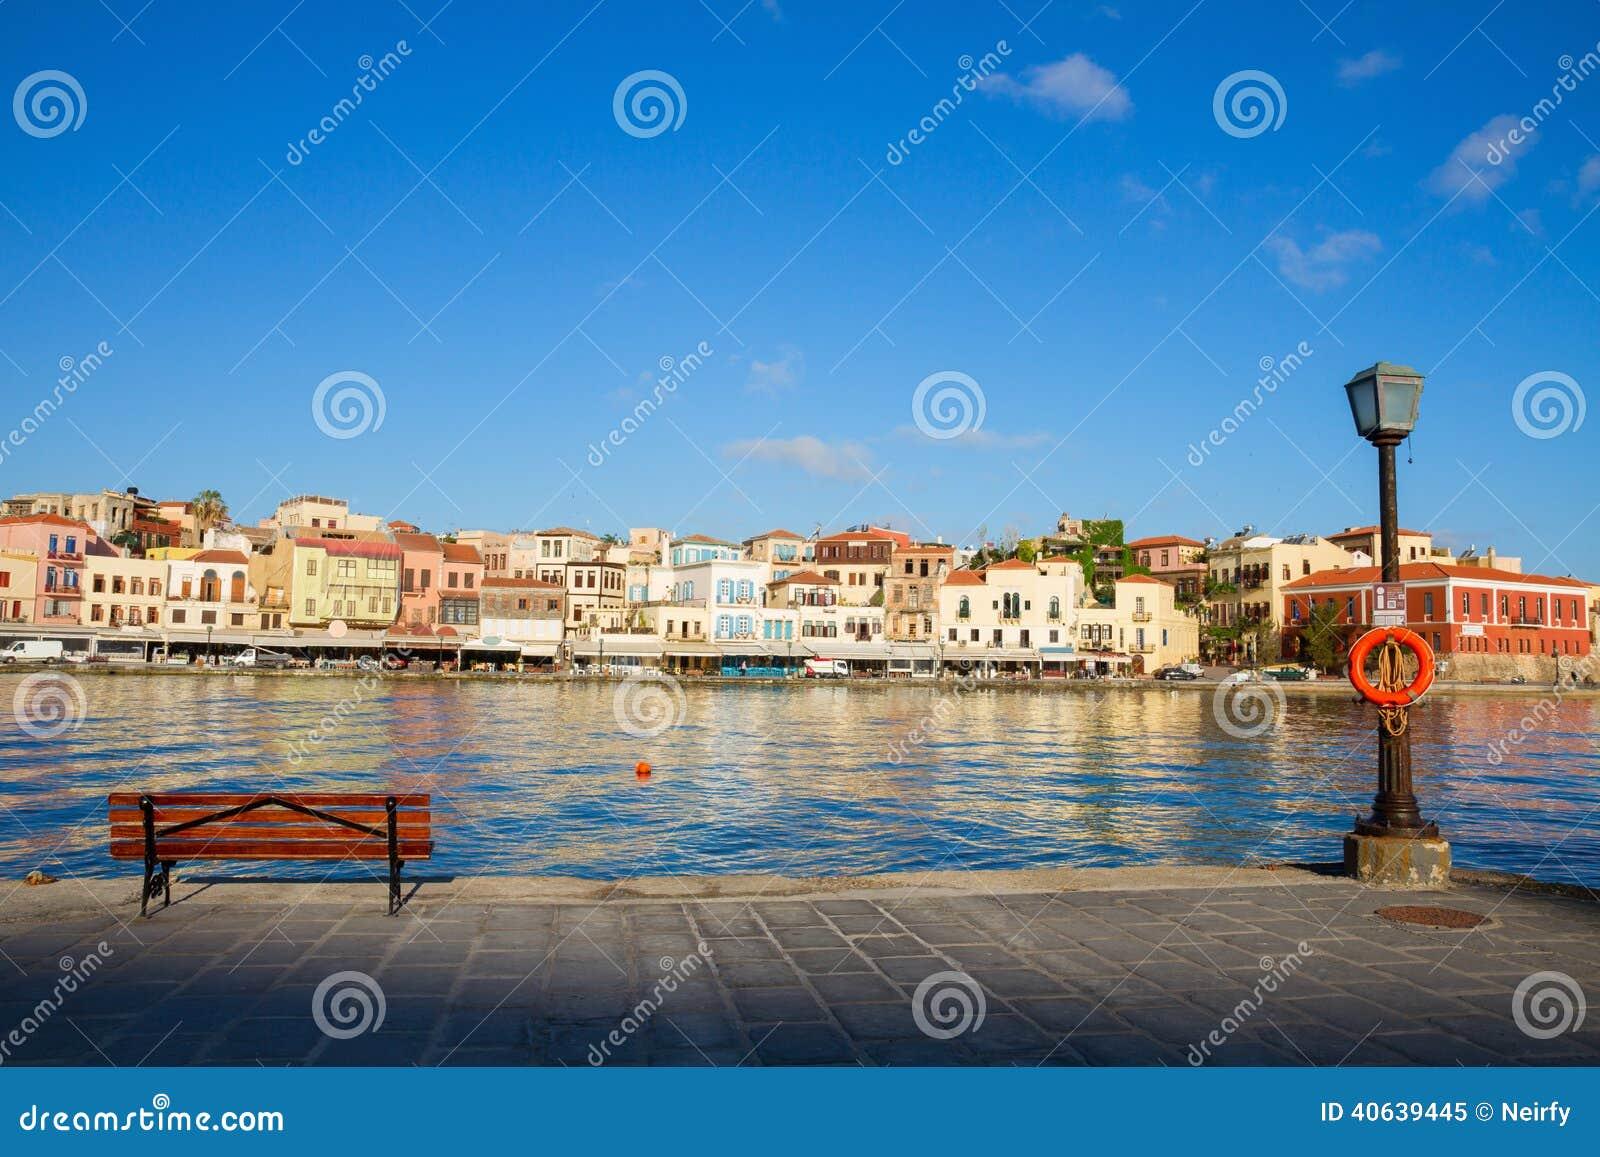 Venetian Habour Of Chania, Crete, Greece Stock Photo - Image: 40639445